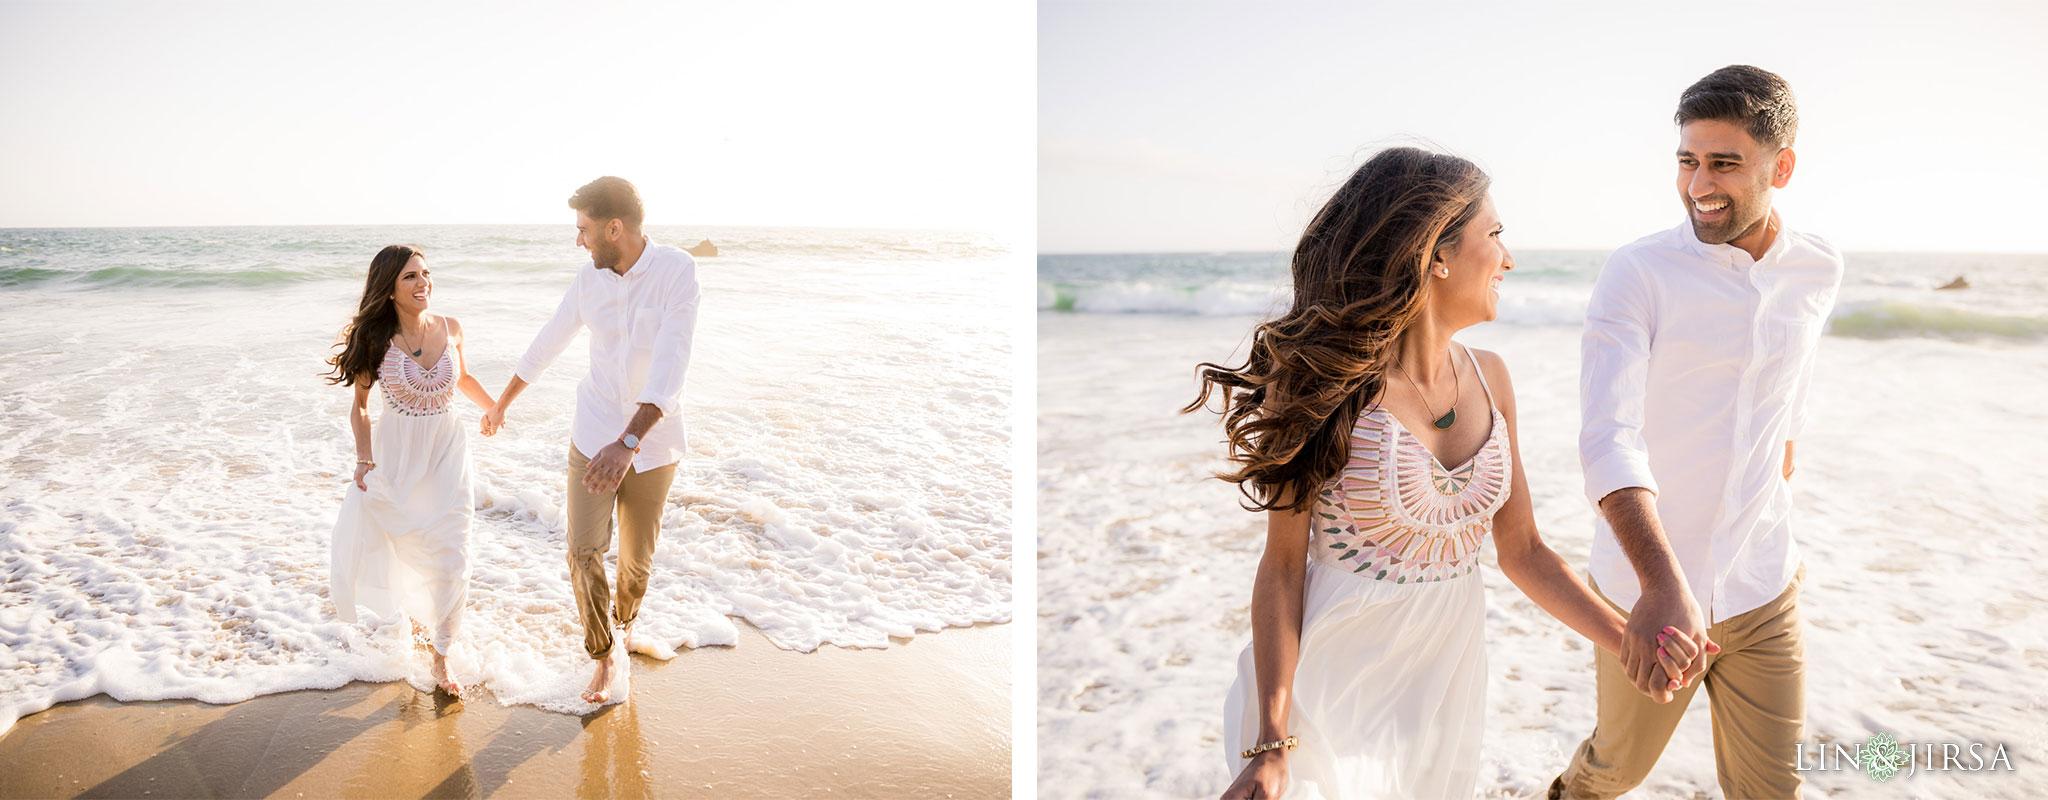 08 Laguna Beach Orange County Engagement Photography